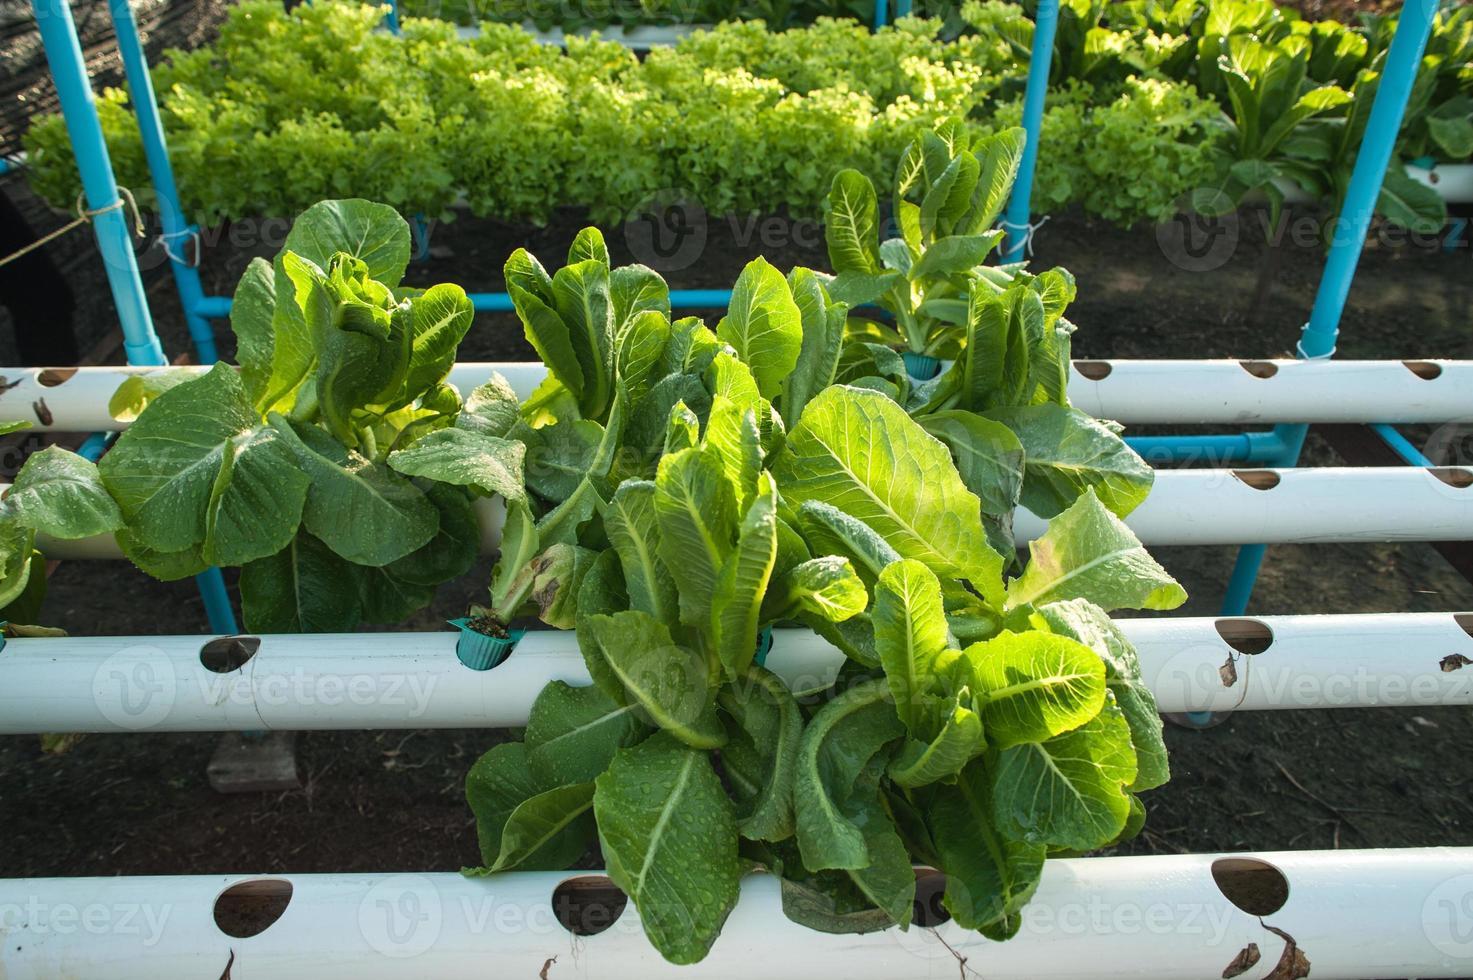 Green organic, cultivation hydroponics vegetable in farm photo